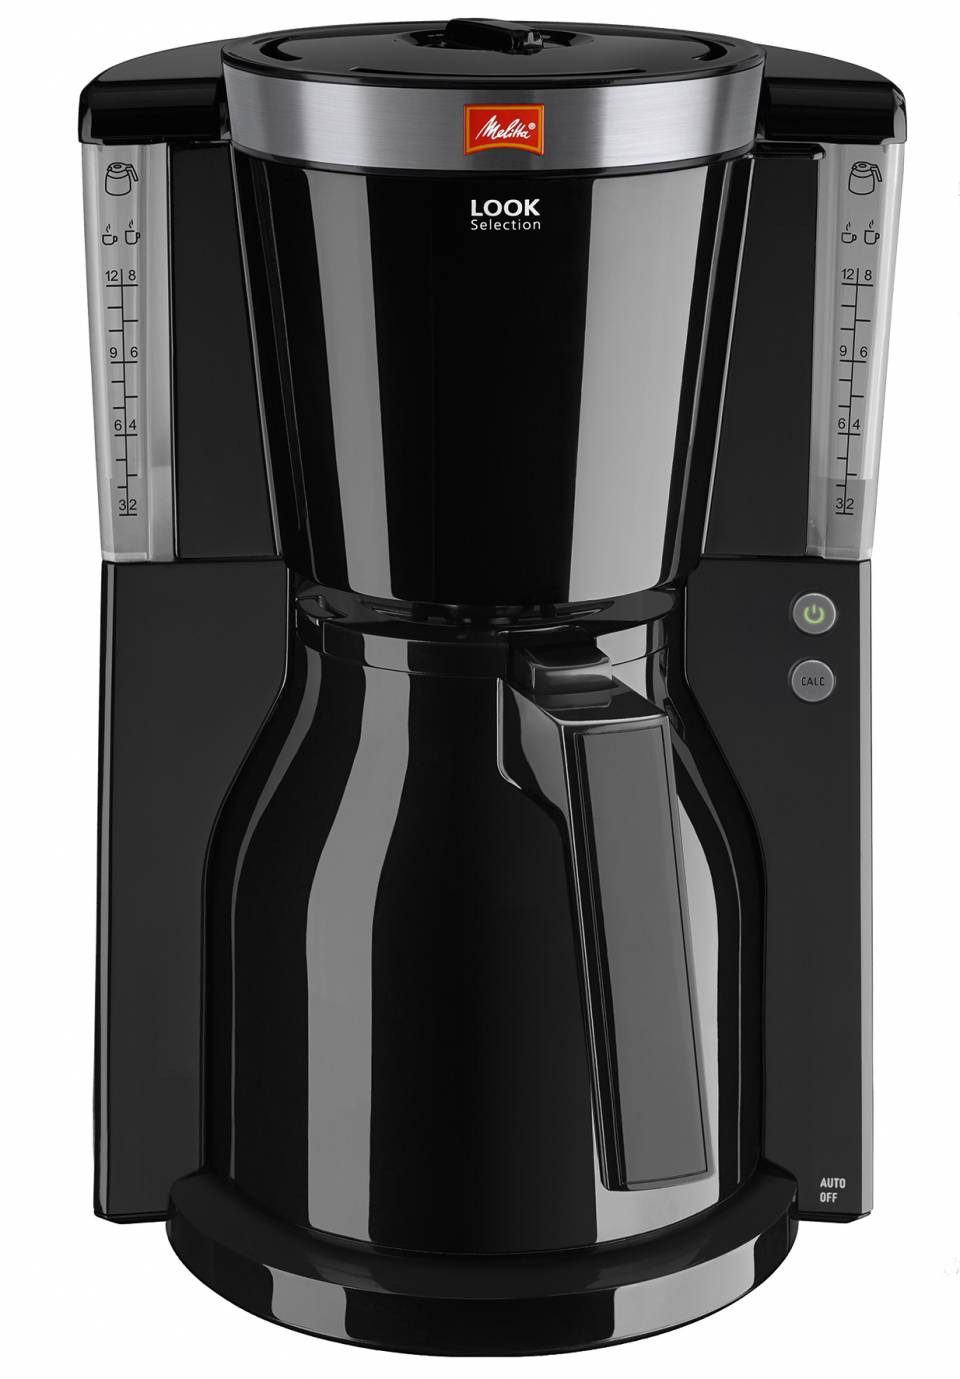 Melitta Kaffeemaschine Look Therm Selection mit Edelstahl-Blende am Filterdeckel.